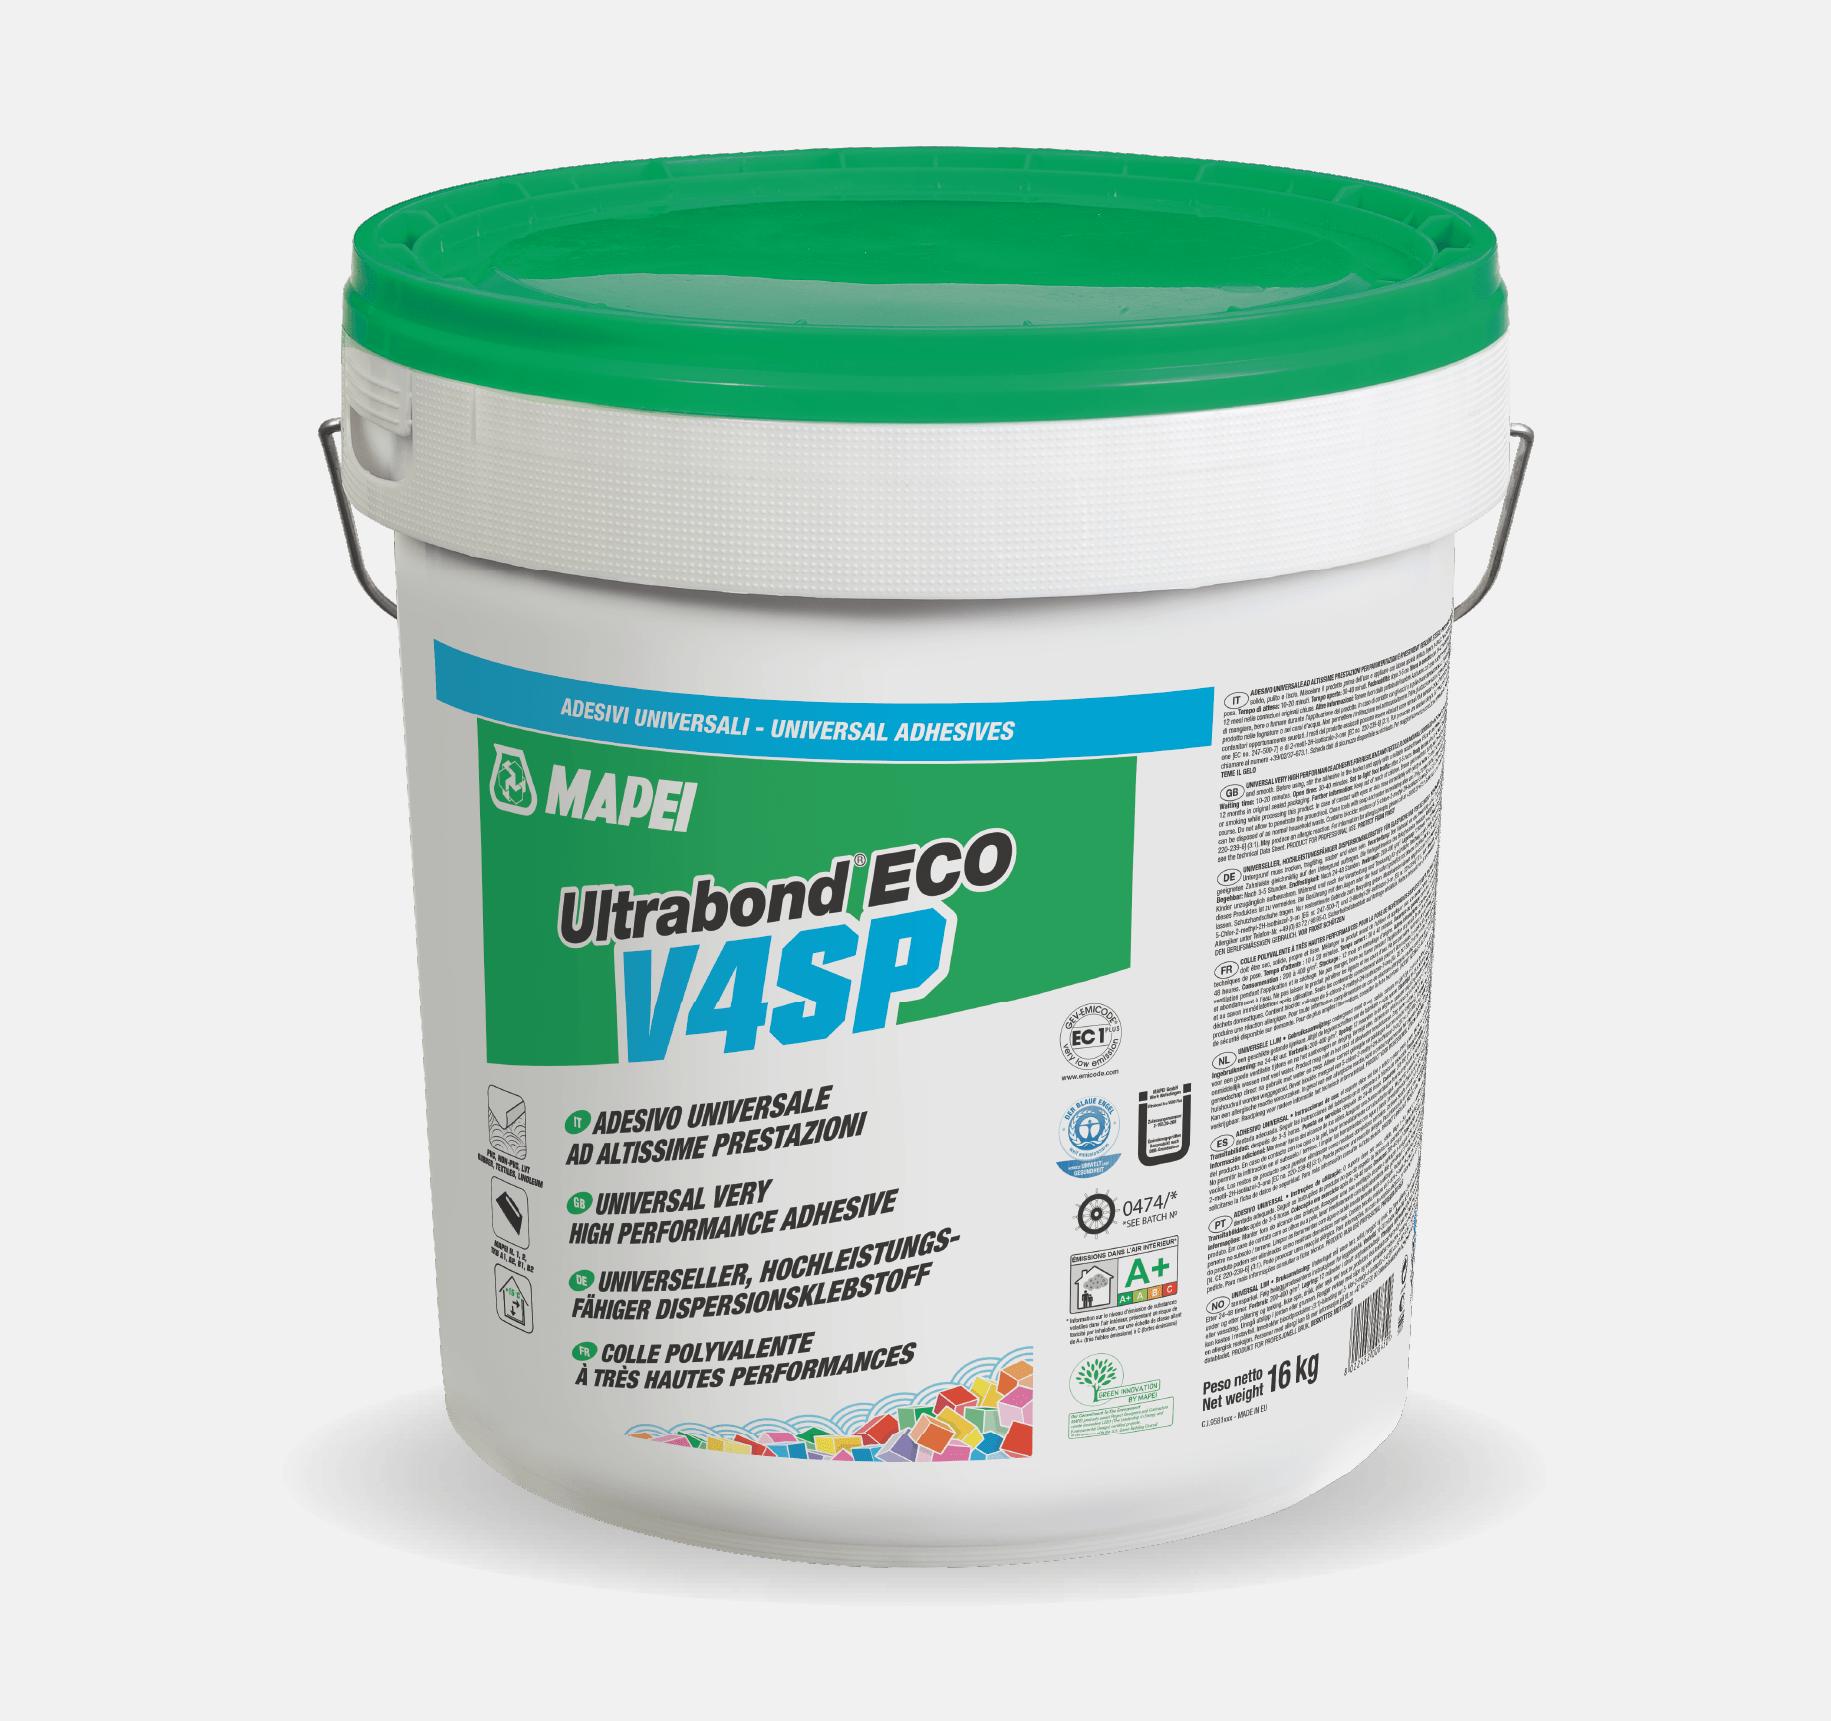 eco-adhesive-for-vinyl-flooring